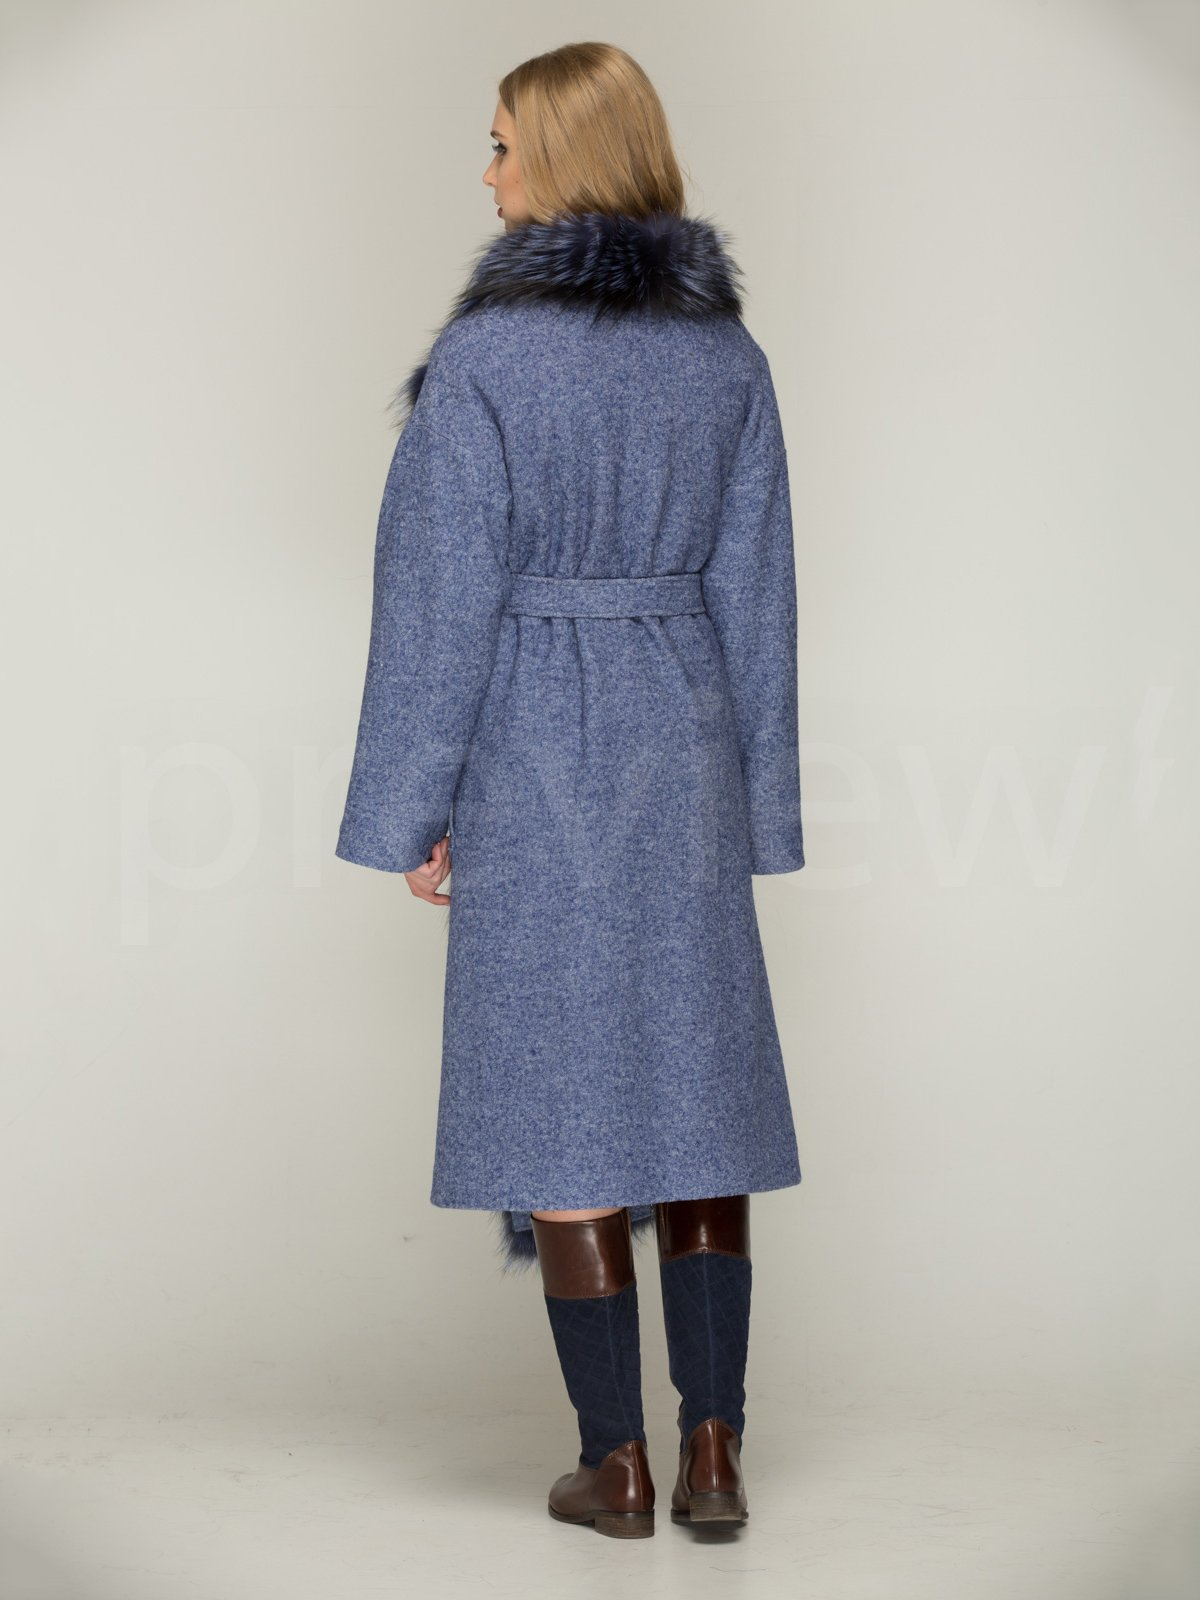 Пальто синє | 3566467 | фото 3